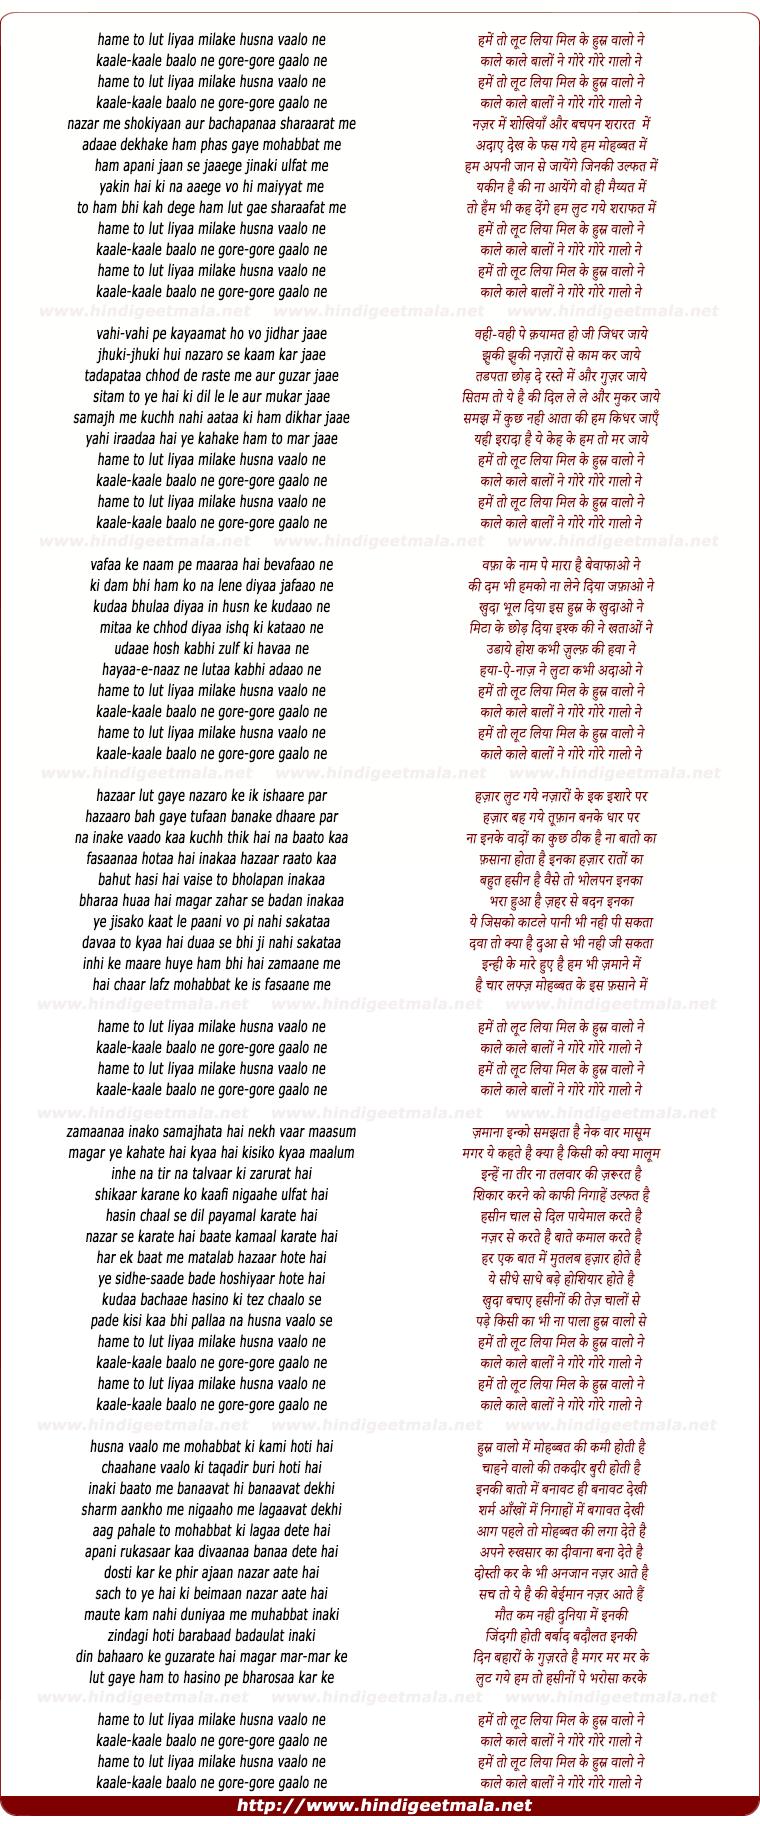 lyrics of song Hamen To Lut Liyaa Milake Husn Vaalon Ne